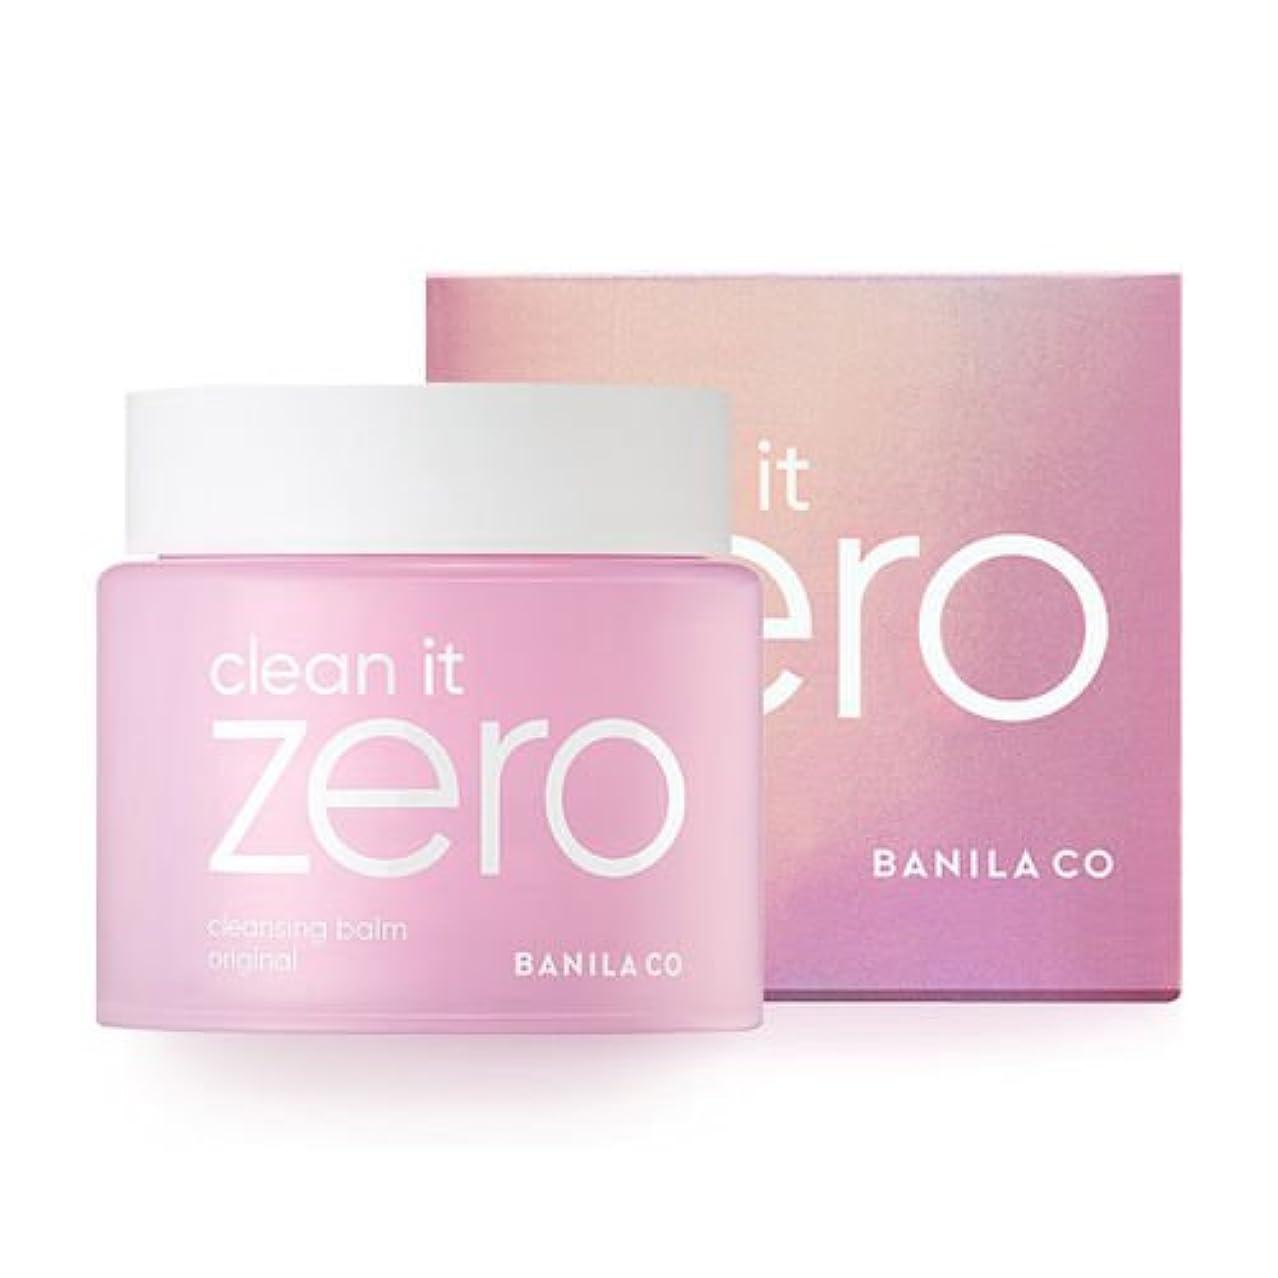 [BANILACO/バニラコ] Clean it zero cleansing balm original 180ml / クリンイットゼロ クレンジングバーム オリジナル 180ml